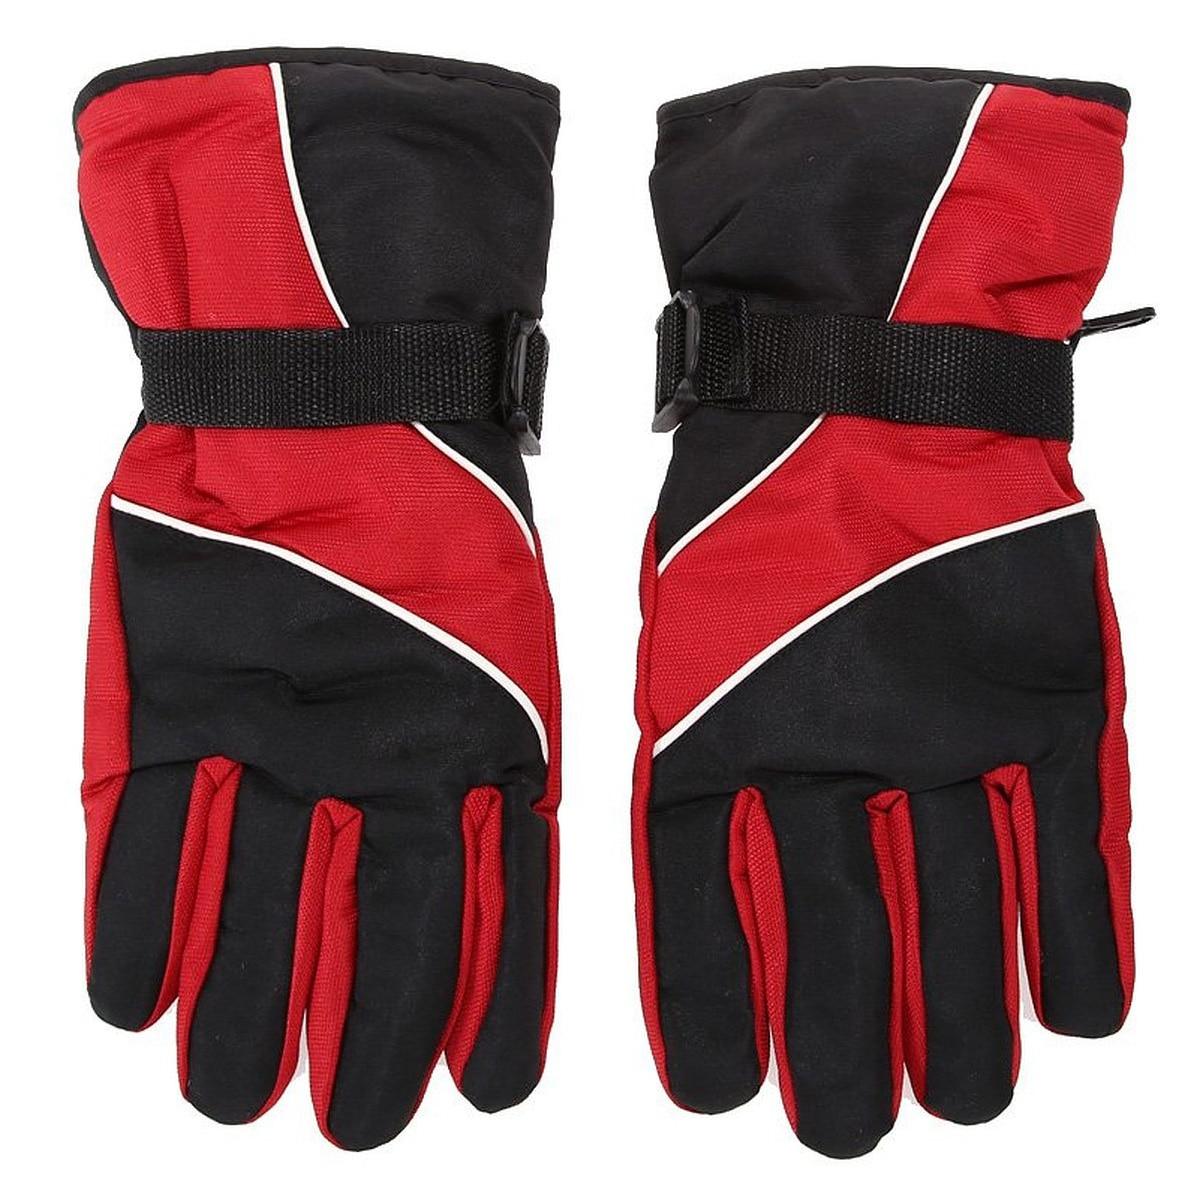 Men font b Ski b font font b Gloves b font Thermal Waterproof For Winter Outdoor